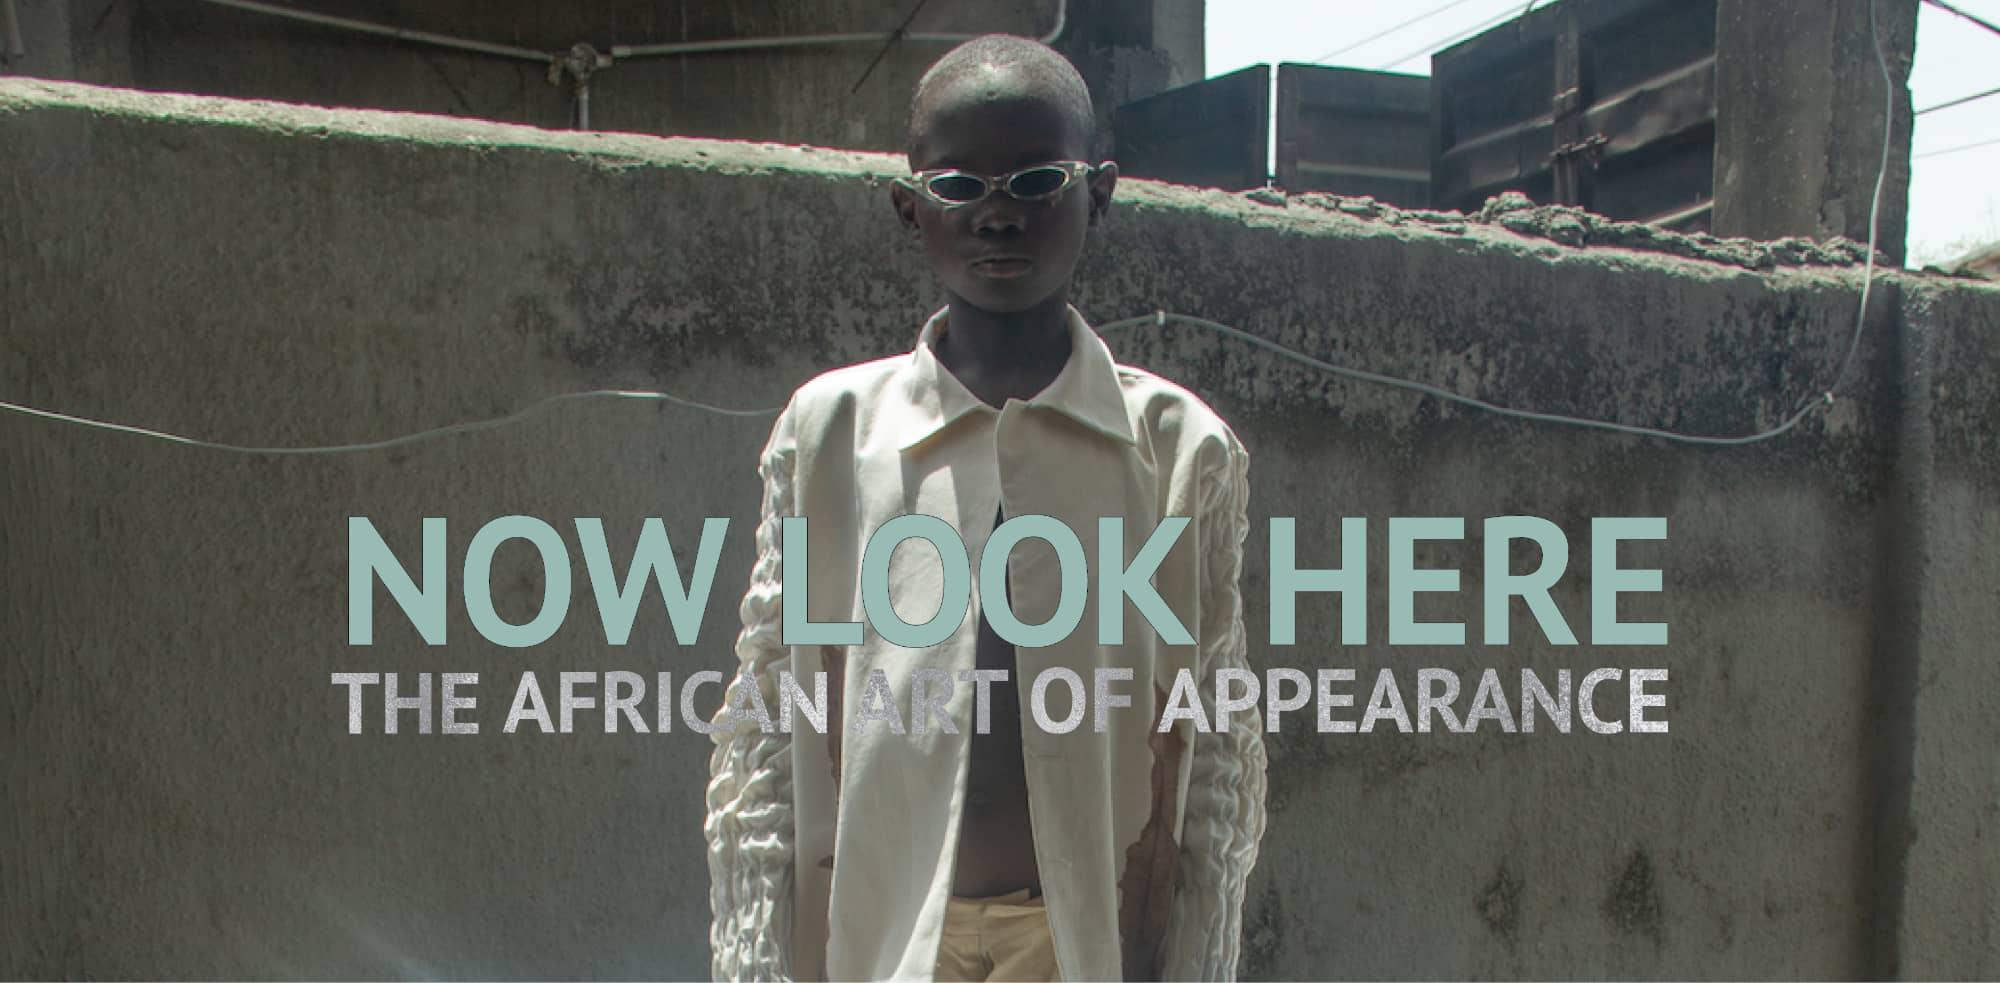 Beeld voor NOW LOOK HERE – The African Art of Appearance, fototentoonstelling begint januari 2020 in Amsterdam Noord